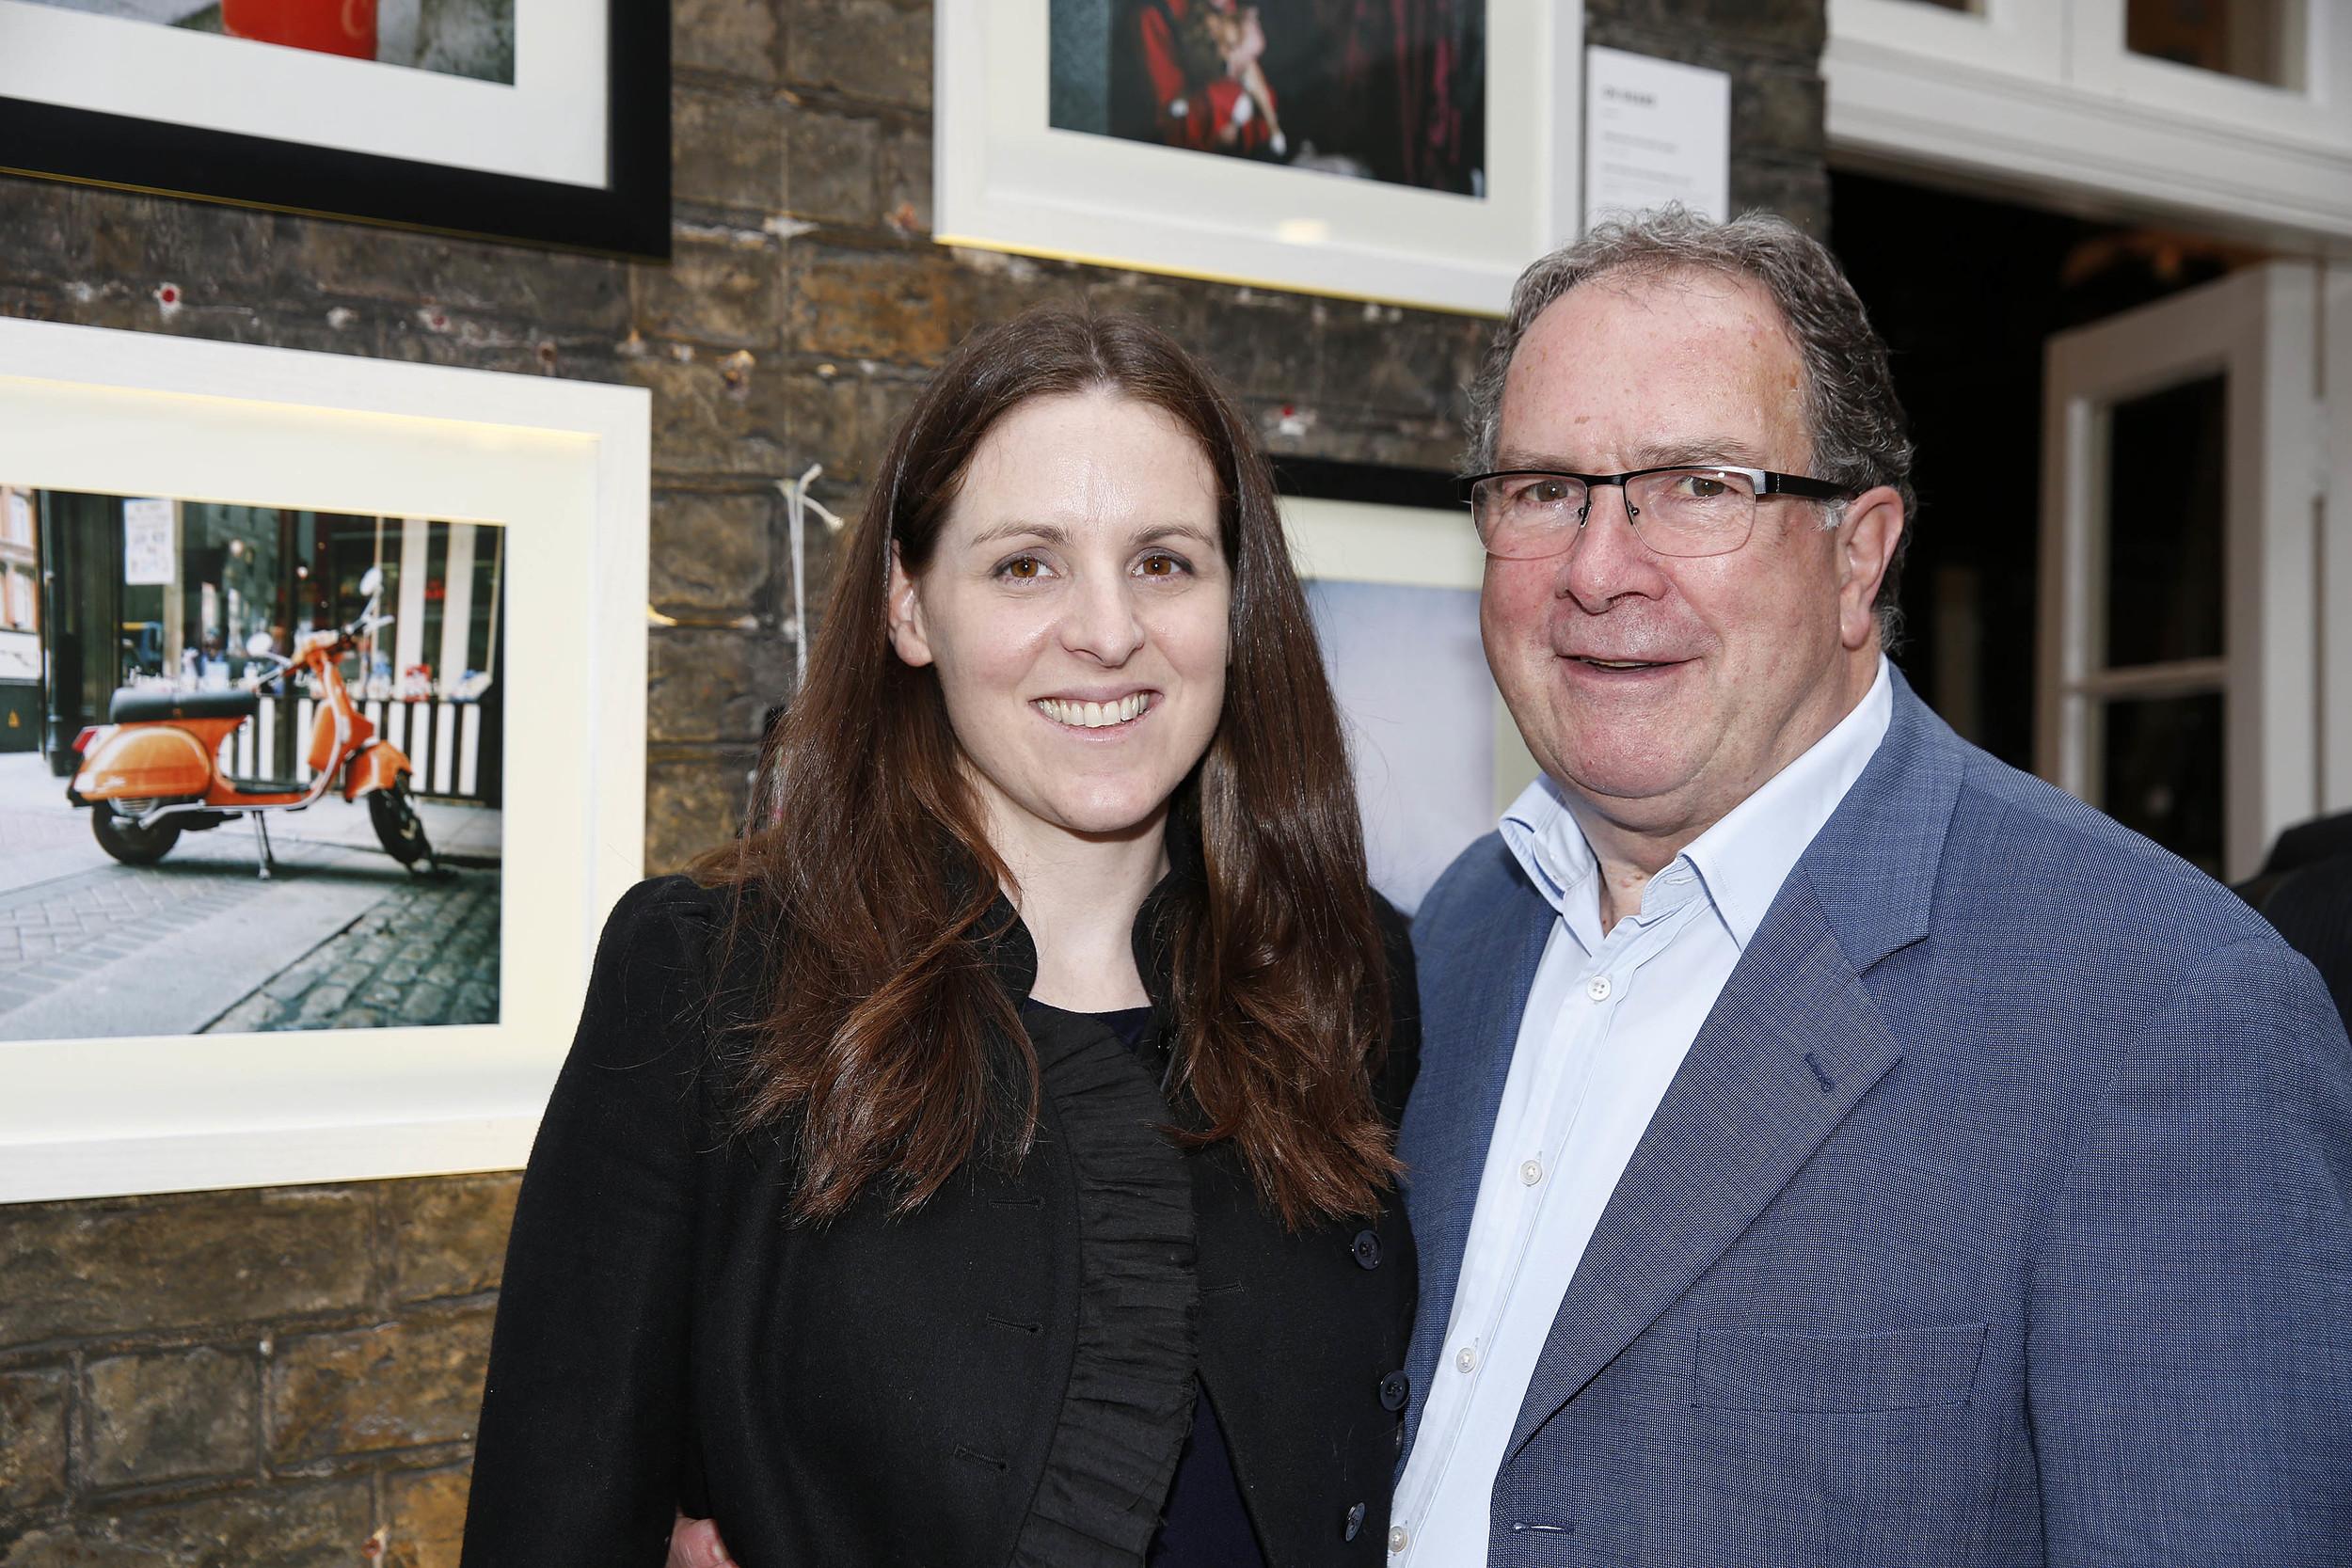 Sam McGuinness, CEO of the Dublin Simon Community, and myself.